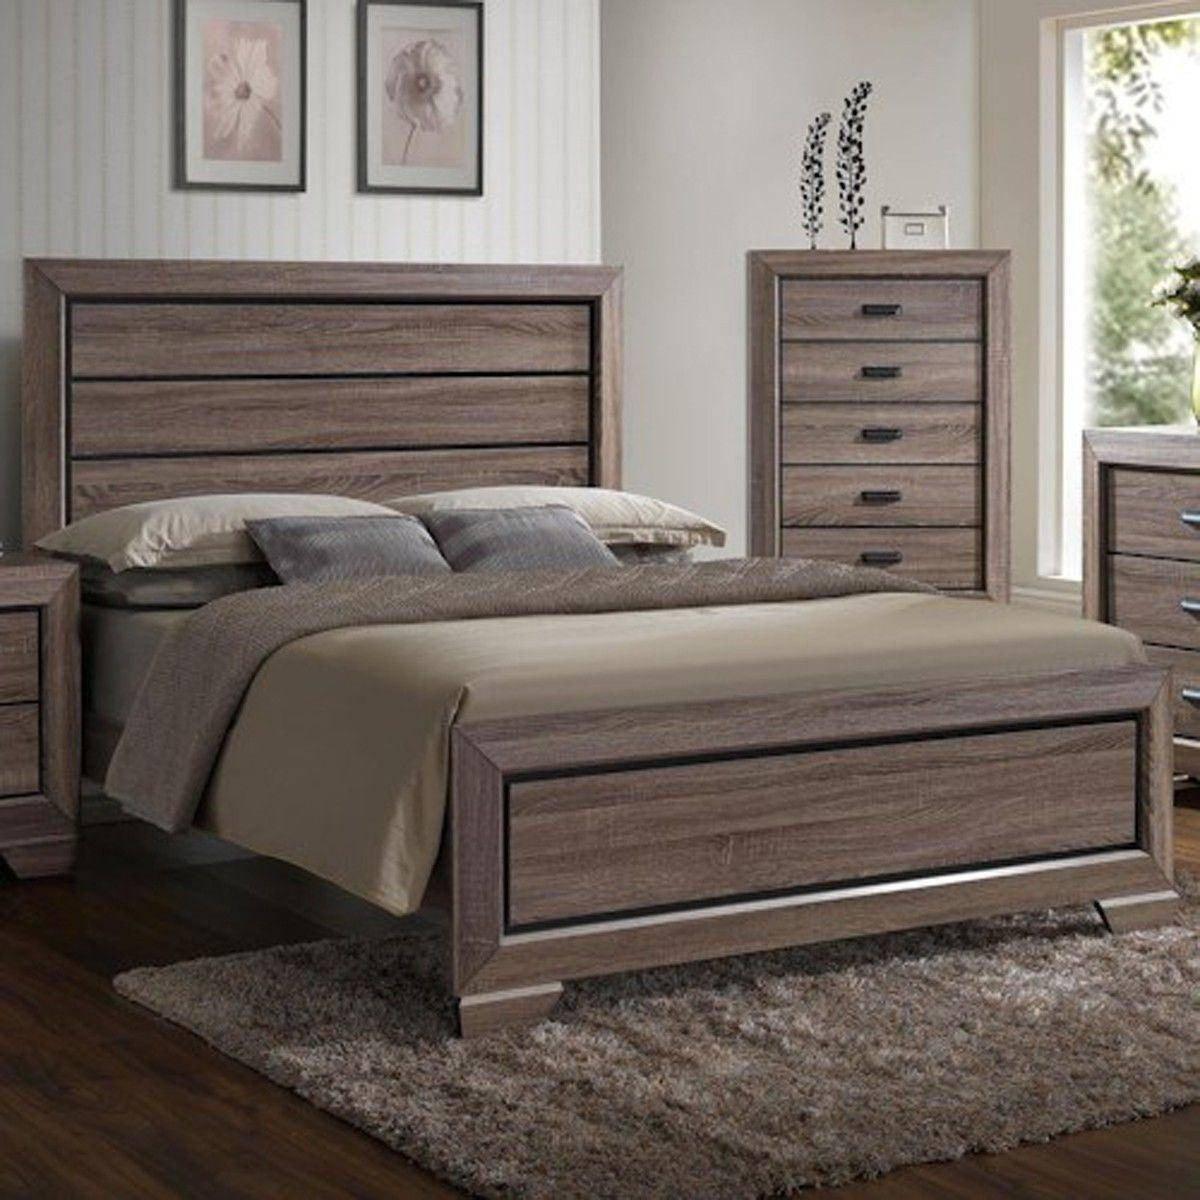 Wooden Bedroom Furniture Set Best Of Crown Mark B5500 Farrow Grey Brown Finish solid Wood Queen